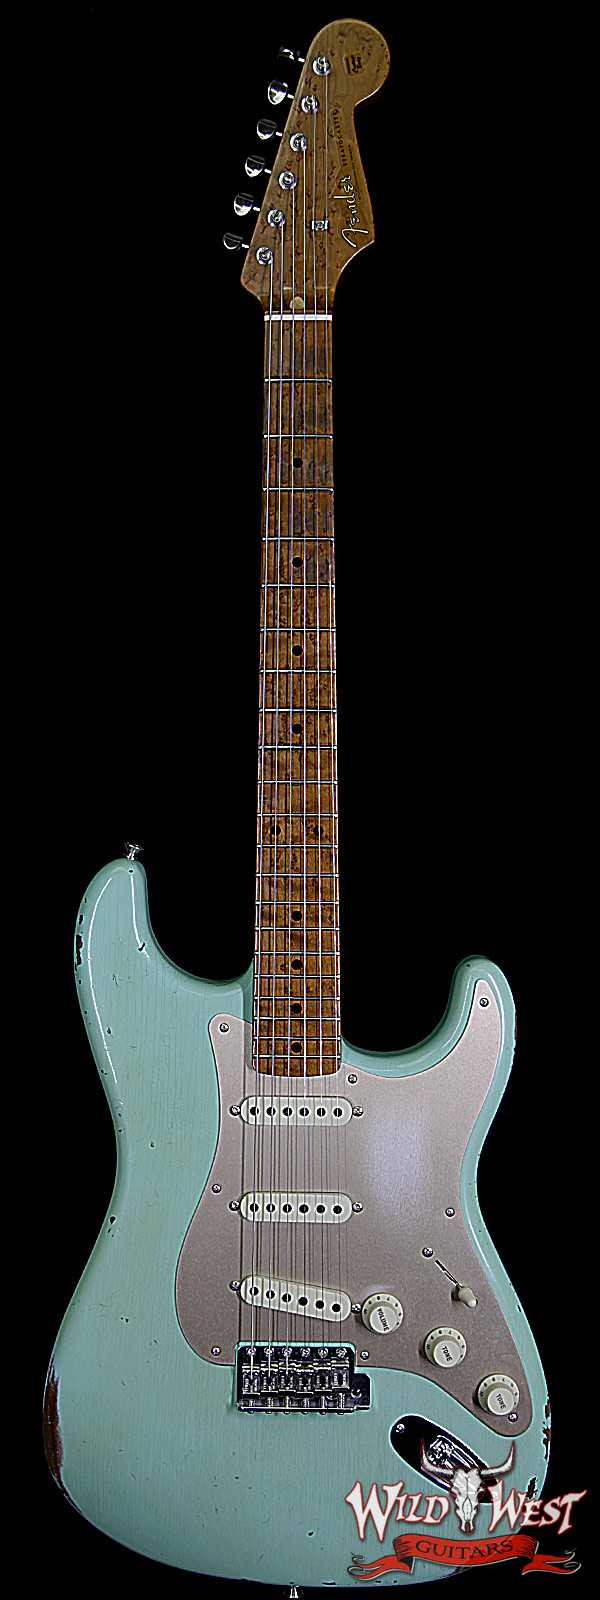 Fender Custom Shop 1956 Stratocaster Relic Roasted Birdeye Maple Neck Surf Green